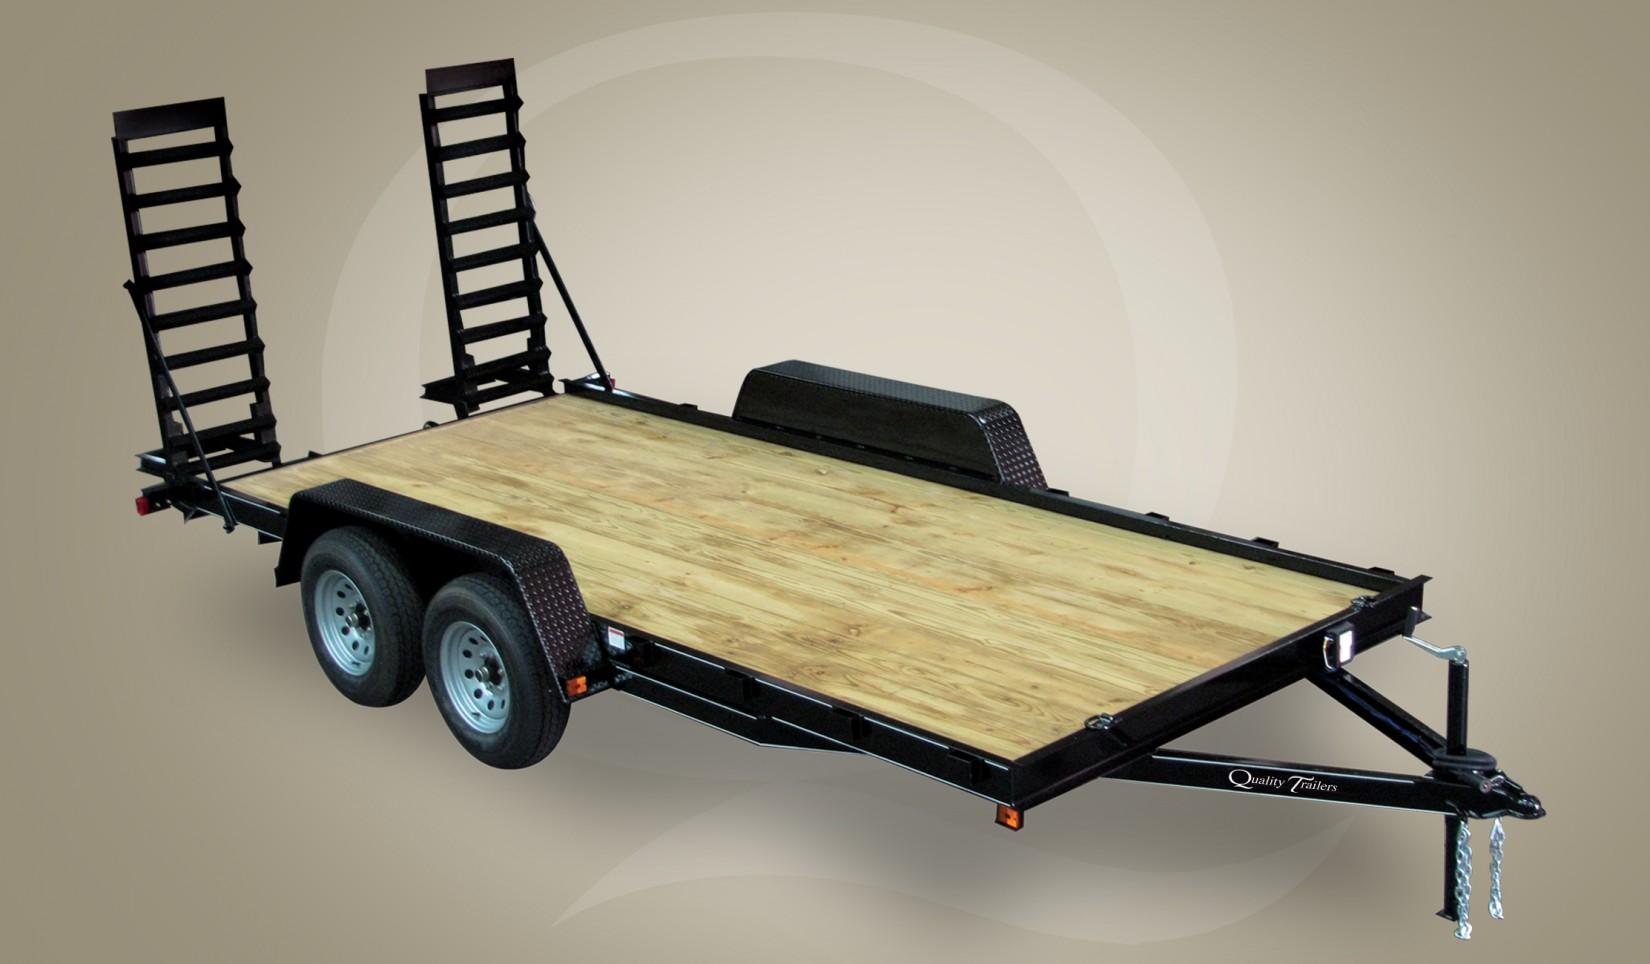 Equipment Trailer Economy Series 8000 Gvwr